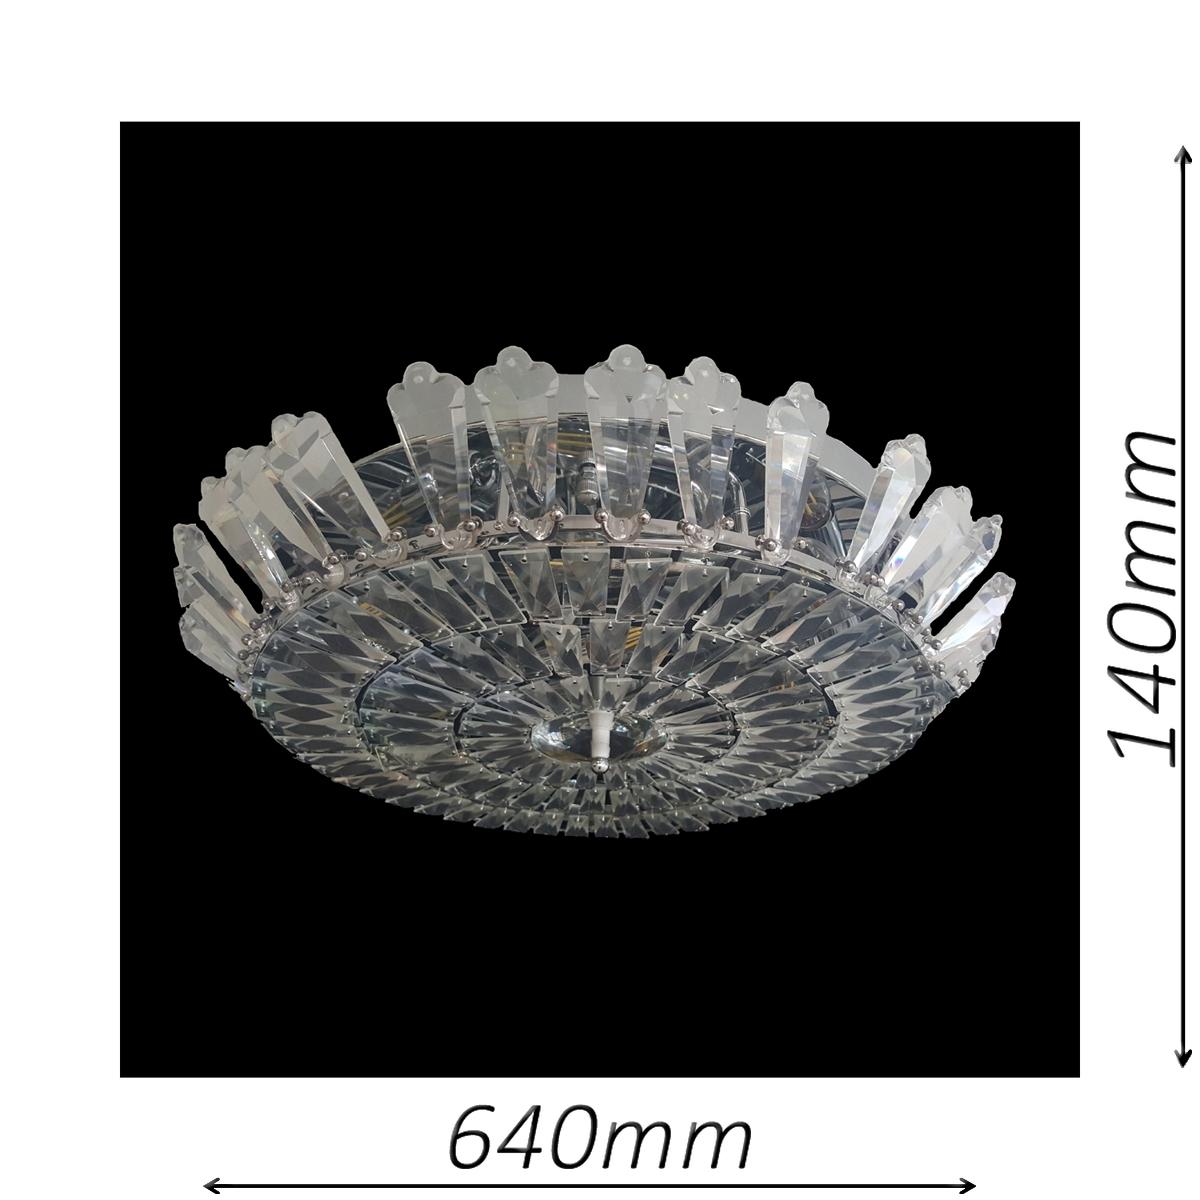 Spherical 640 Chrome Ceiling Light - CTCSPH10640CH